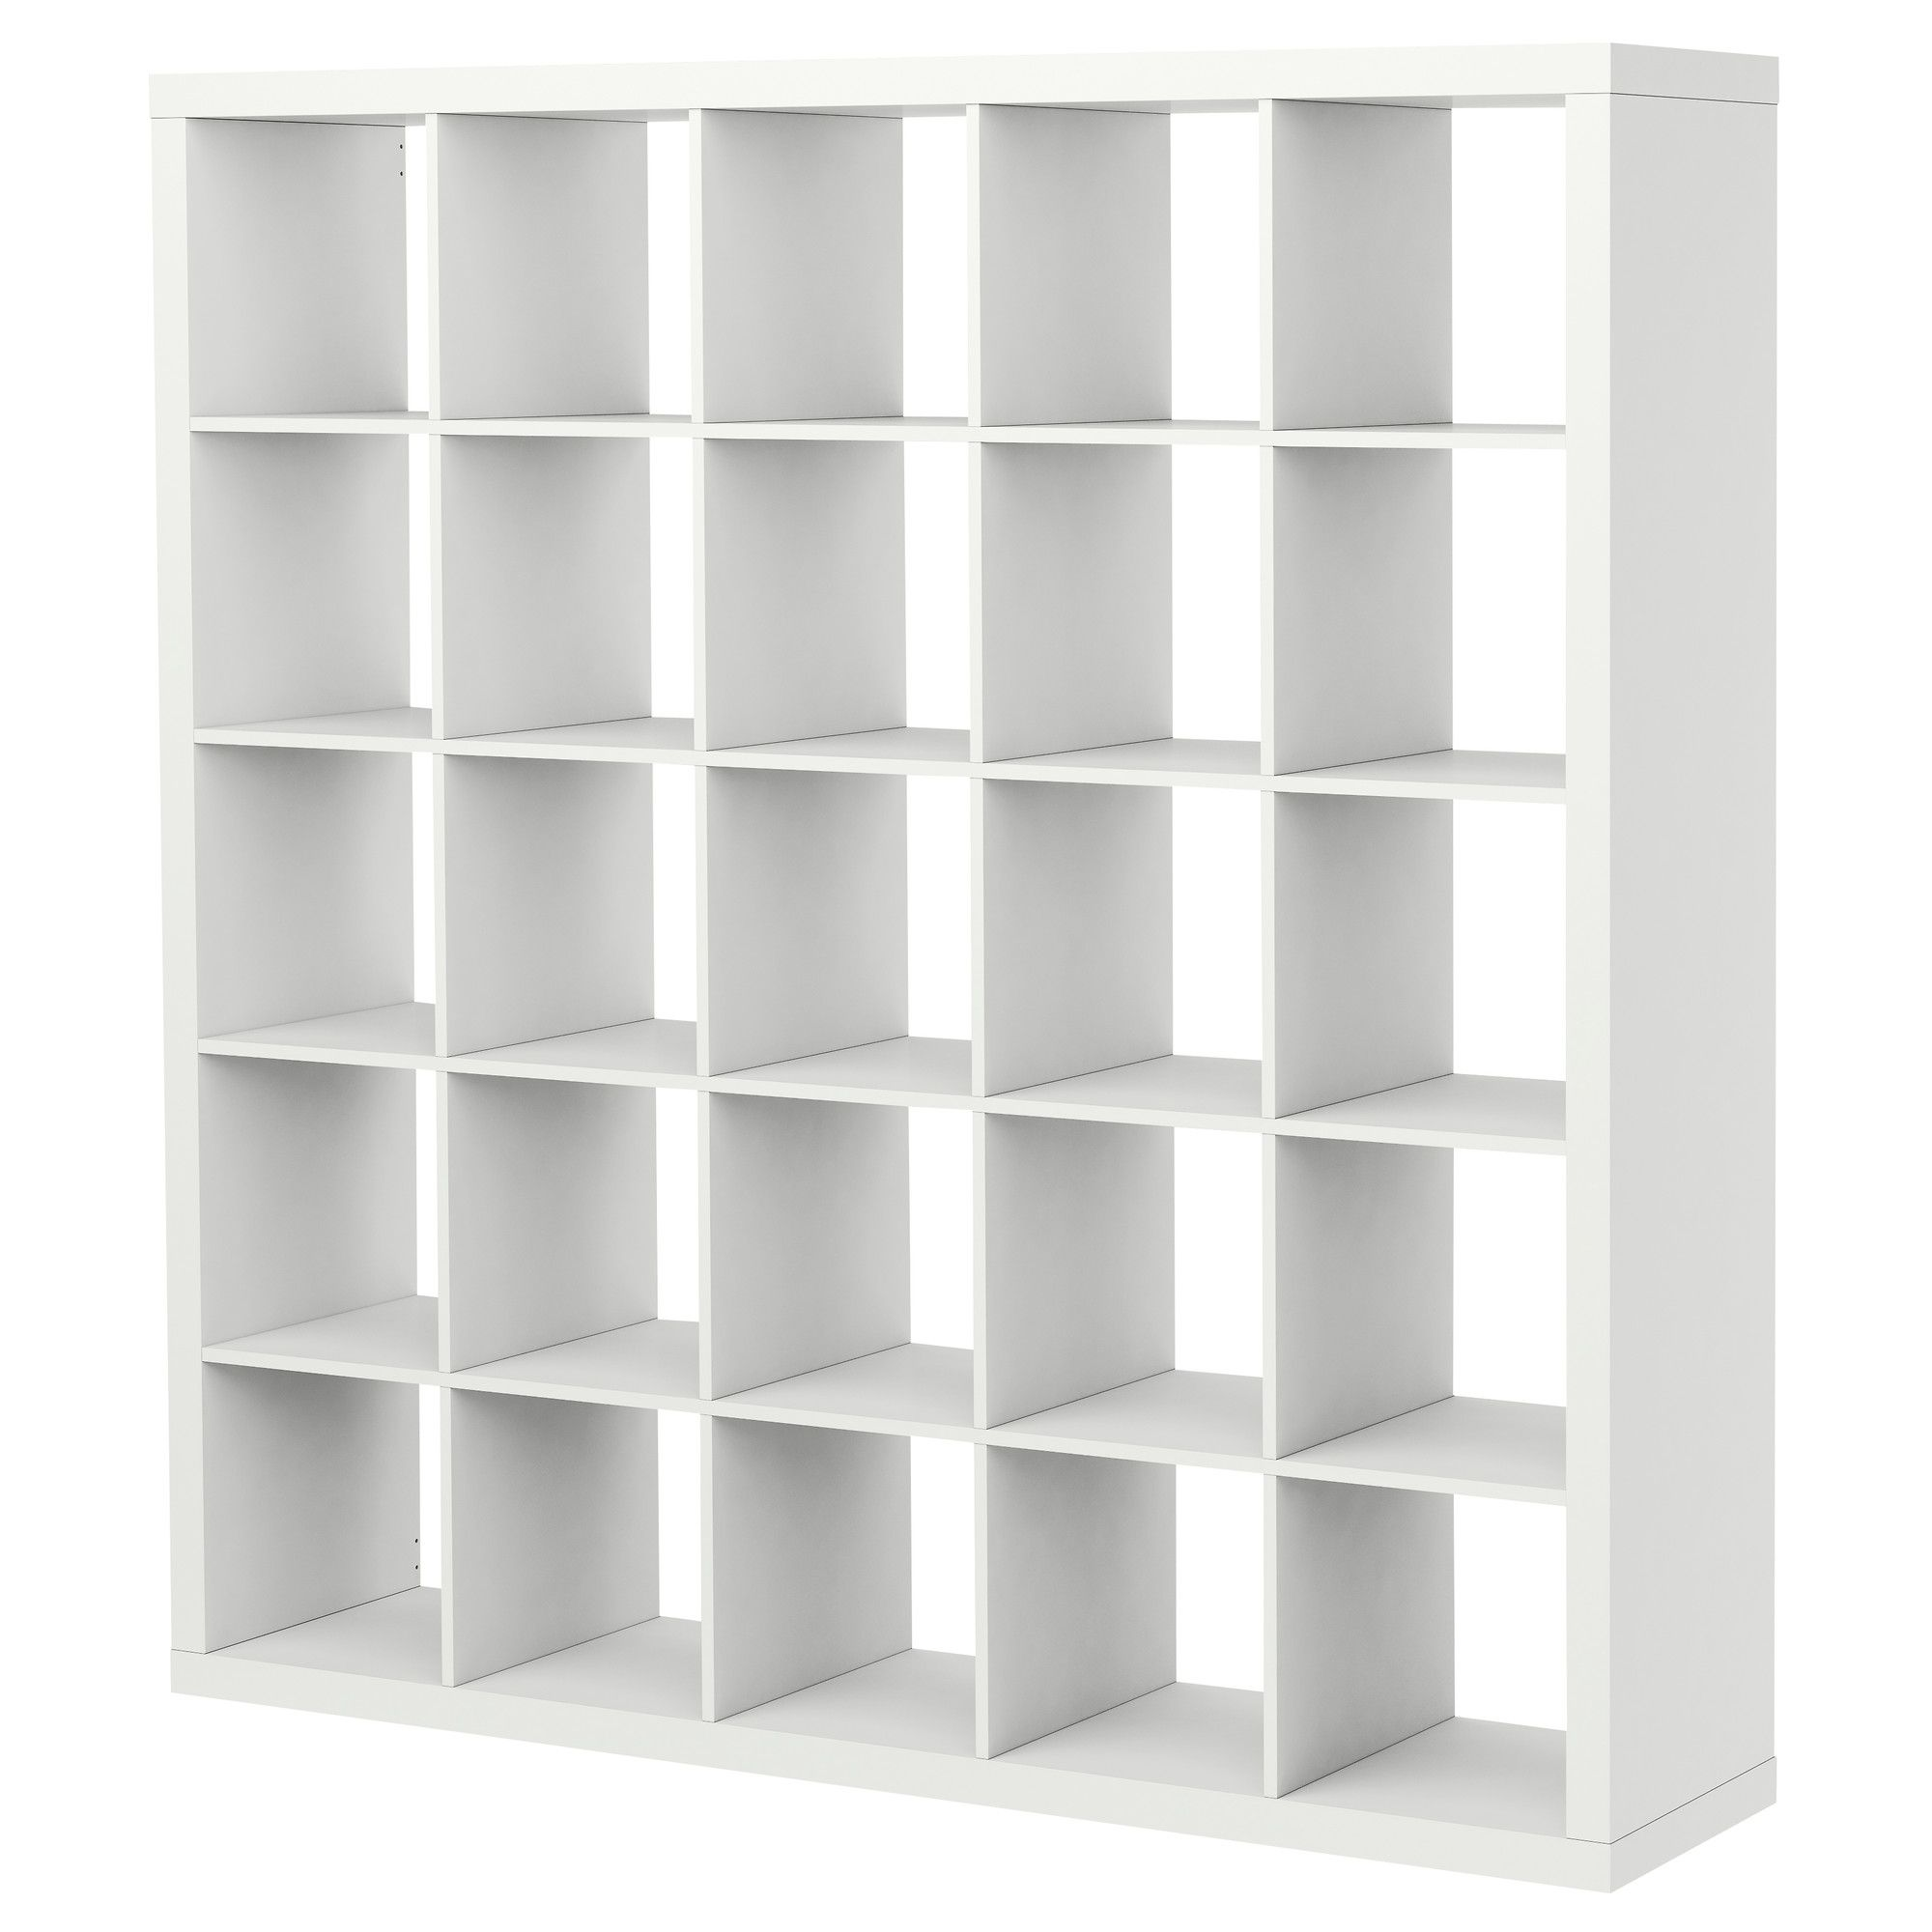 Ikea Us Furniture And Home Furnishings Expedit Bookcase Ikea